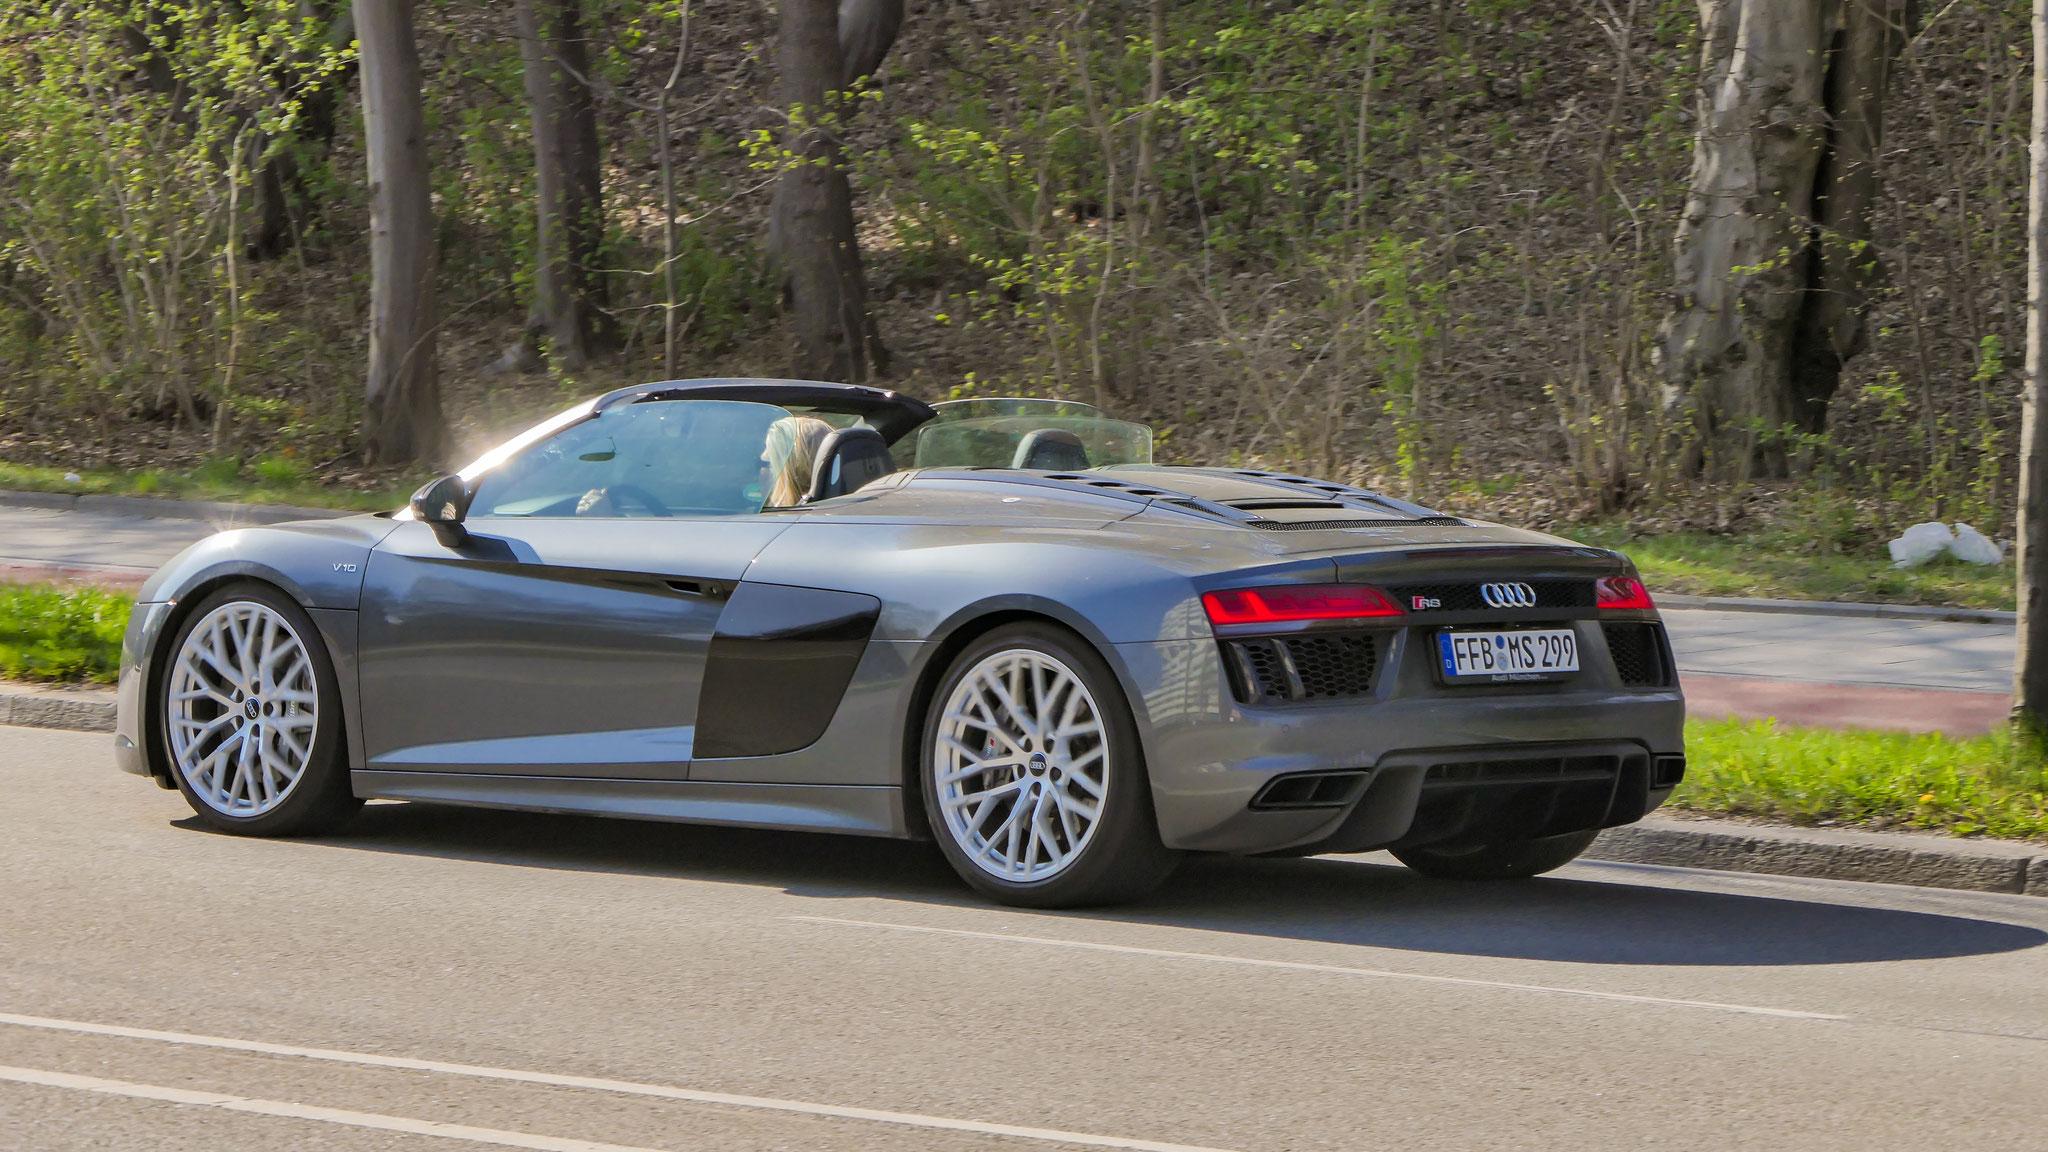 Audi R8 V10 Spyder - FFB-MS-299